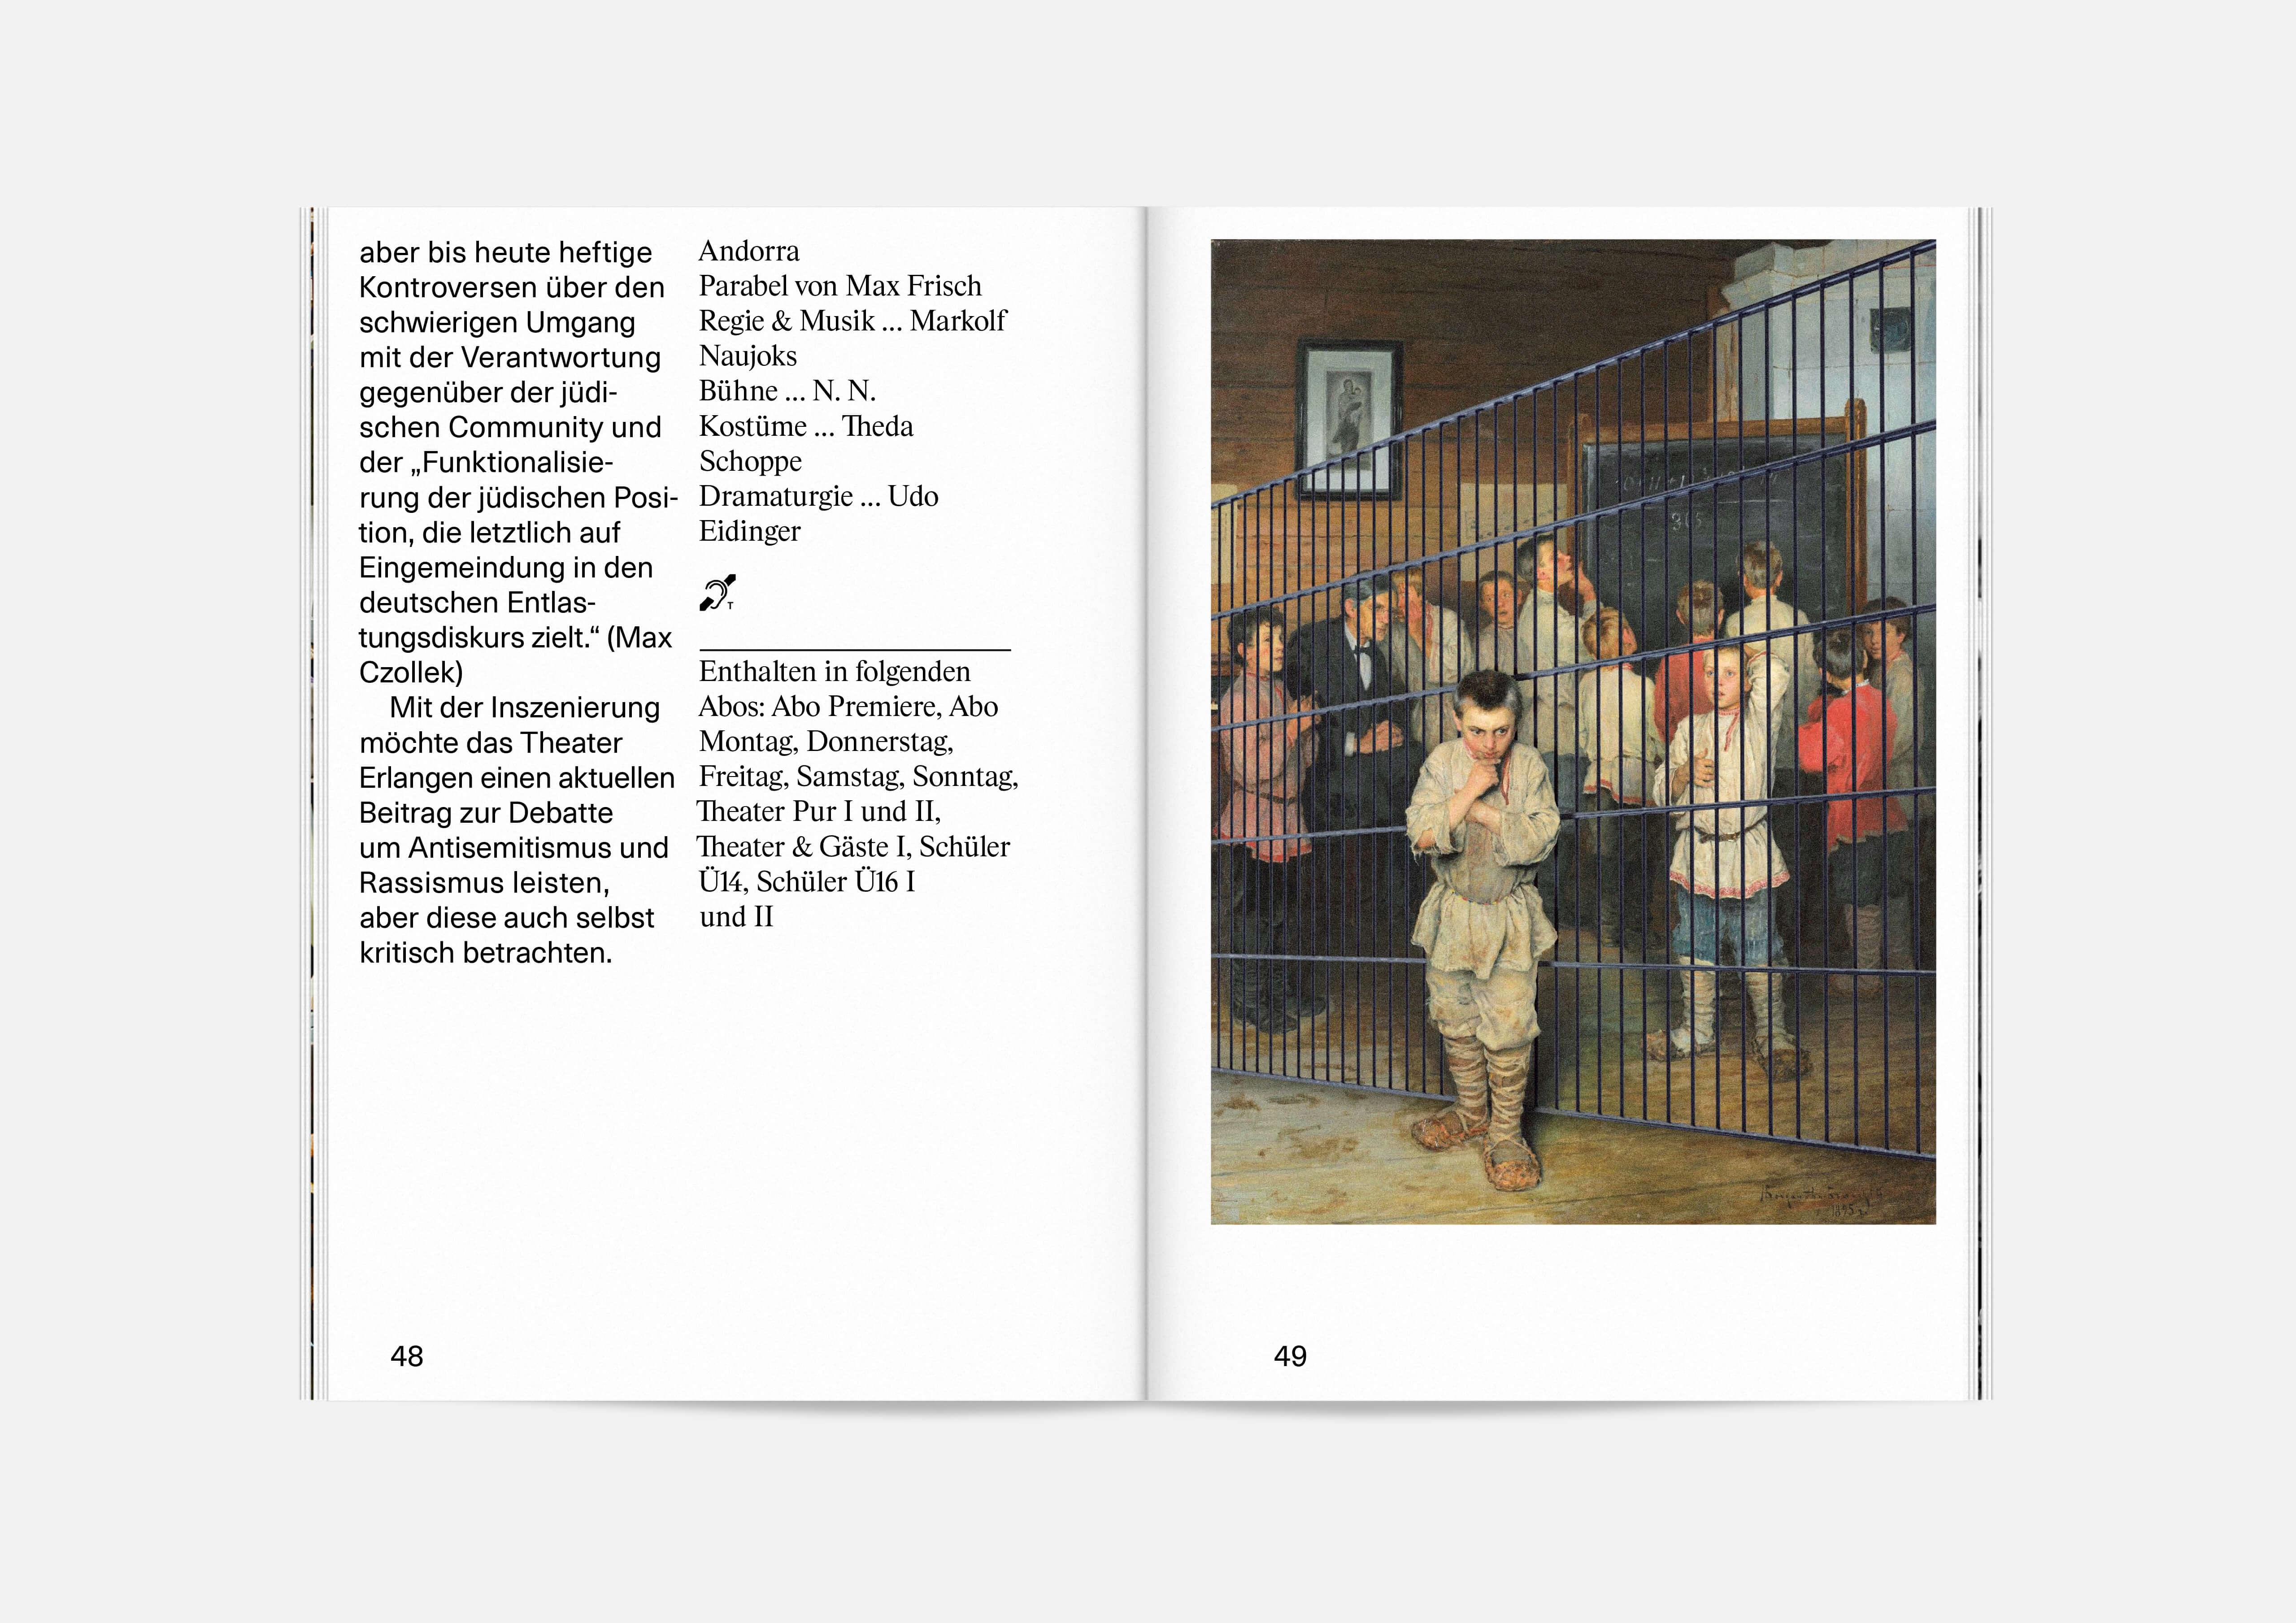 https://neuegestaltung.de/media/pages/clients/theater-erlangen-season-program-20-21/9b8d6ff996-1606409607/17_te-spielzeitheft2021.jpg